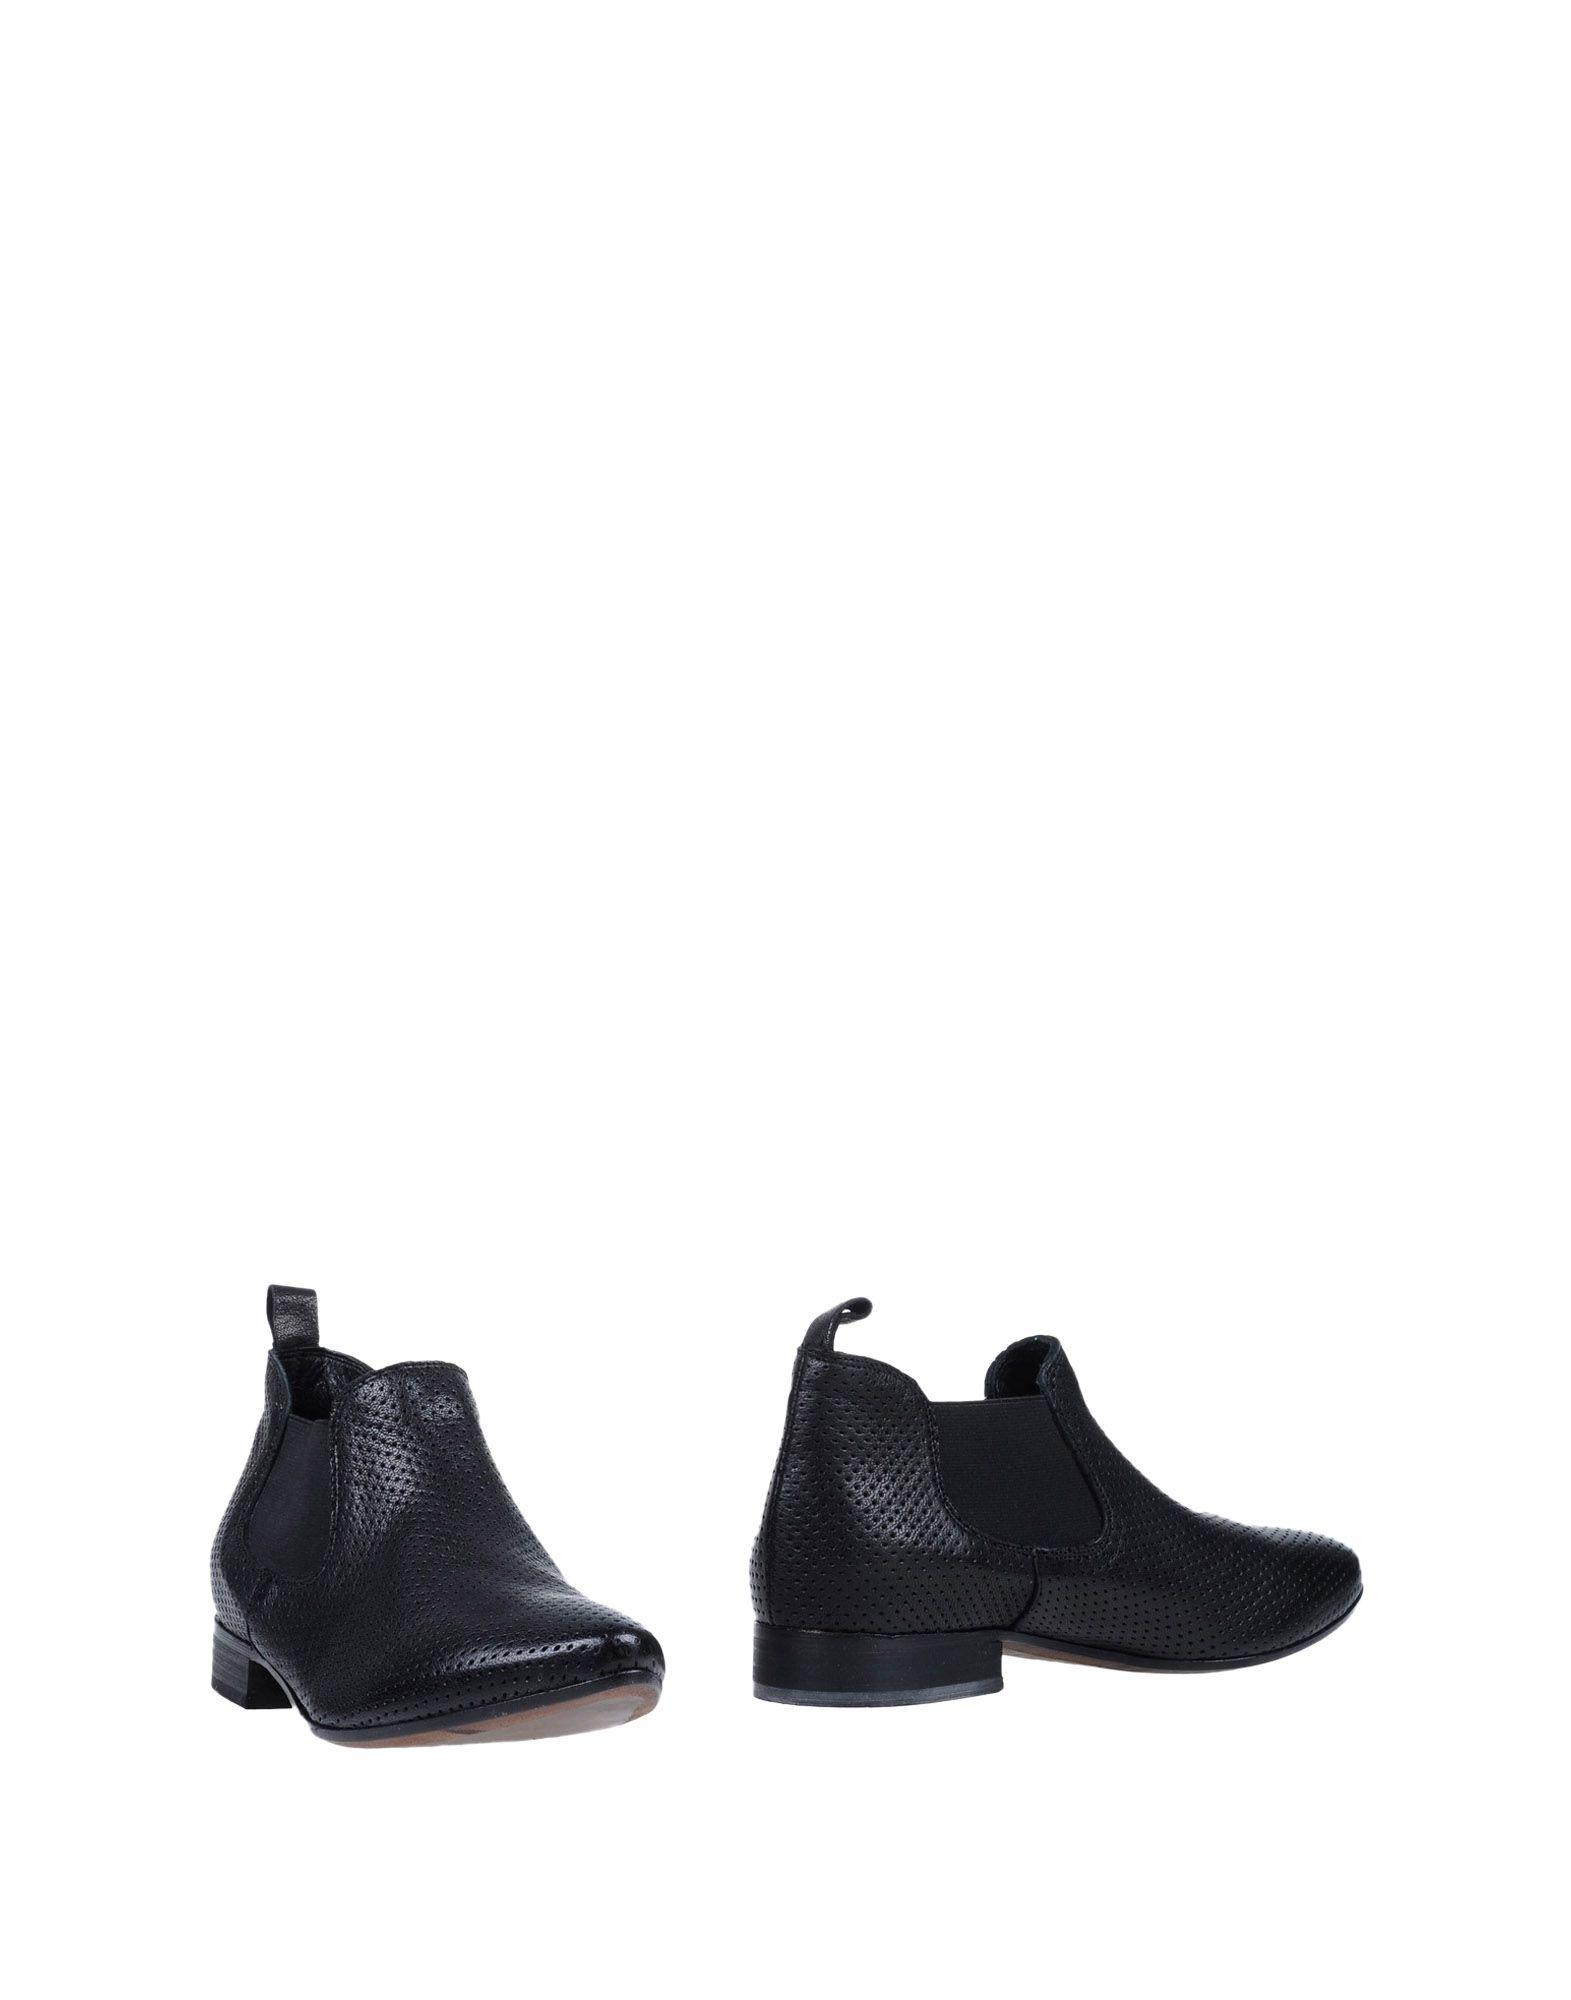 GENEVE Полусапоги и высокие ботинки maliparmi полусапоги и высокие ботинки